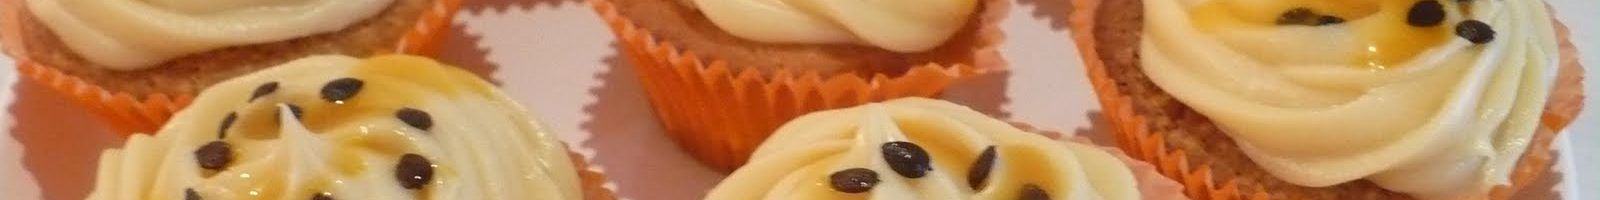 Cupcake diet